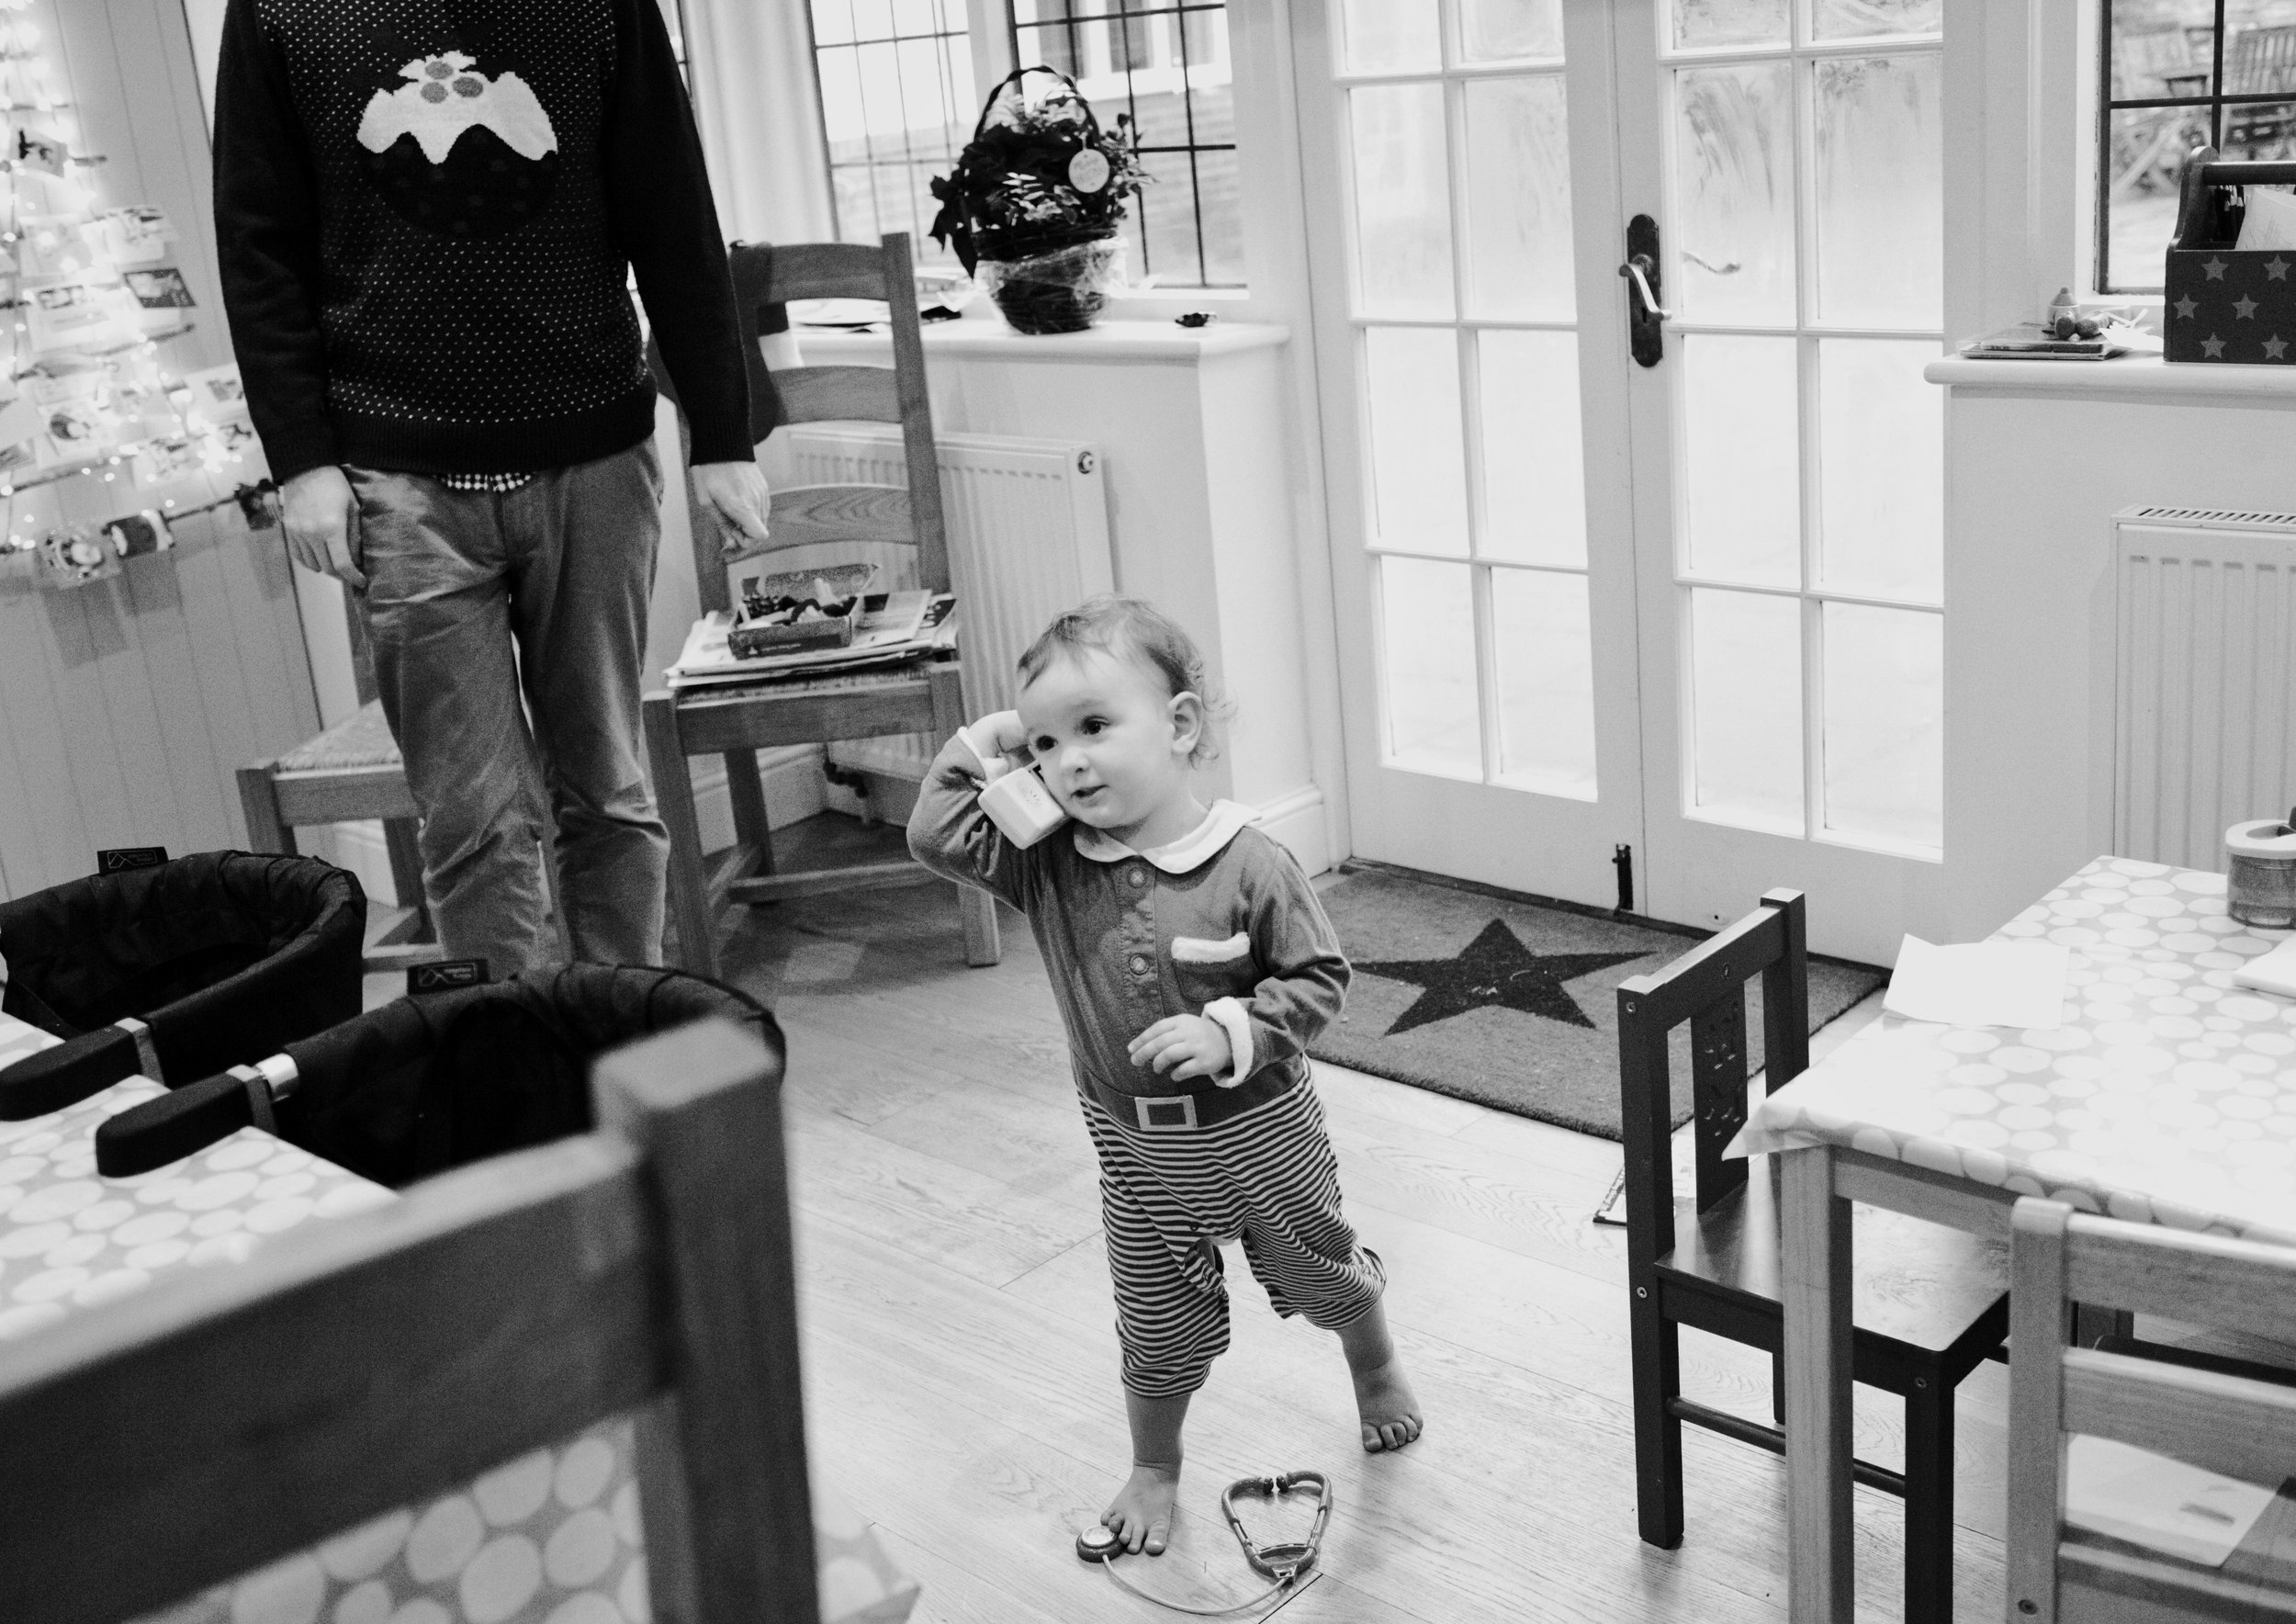 Katie-Collins-Christmas-pictures-44.jpg